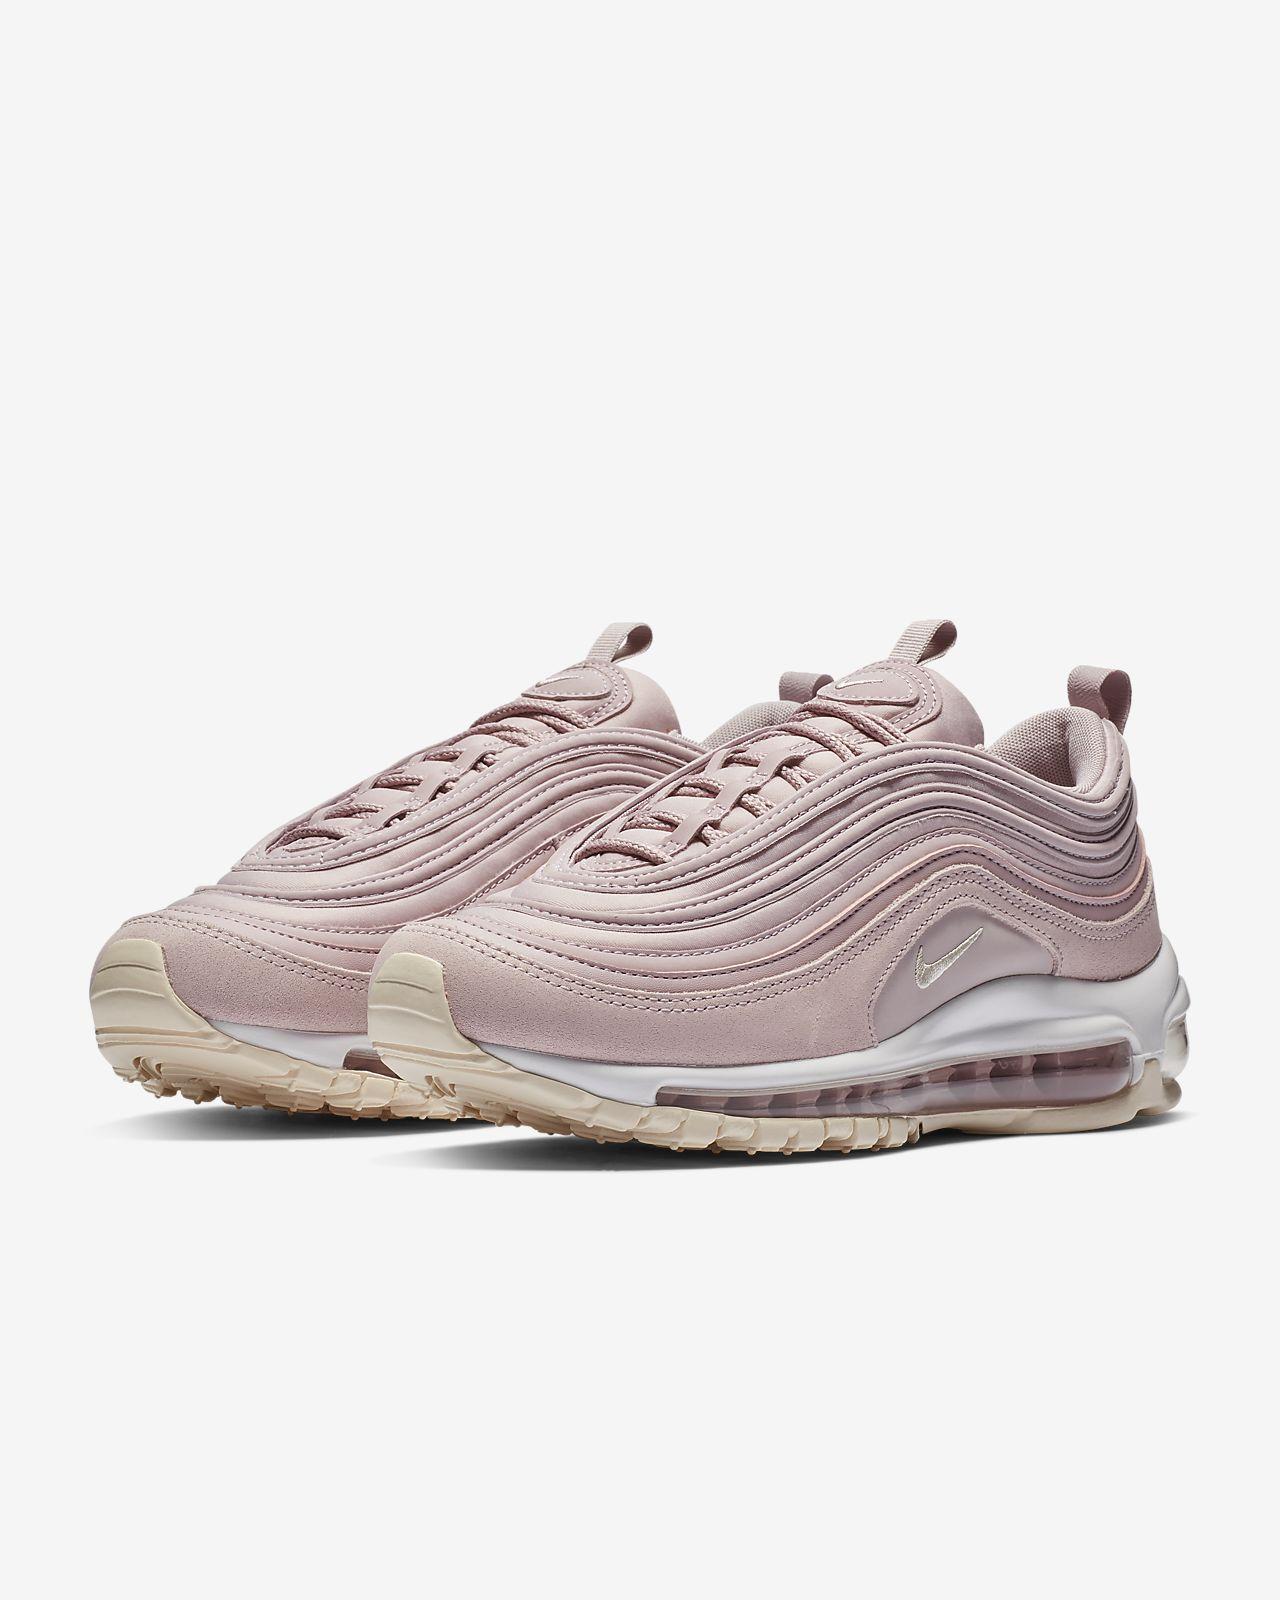 promo code 447d4 1a8c6 ... Nike Air Max 97 Premium Women s Shoe